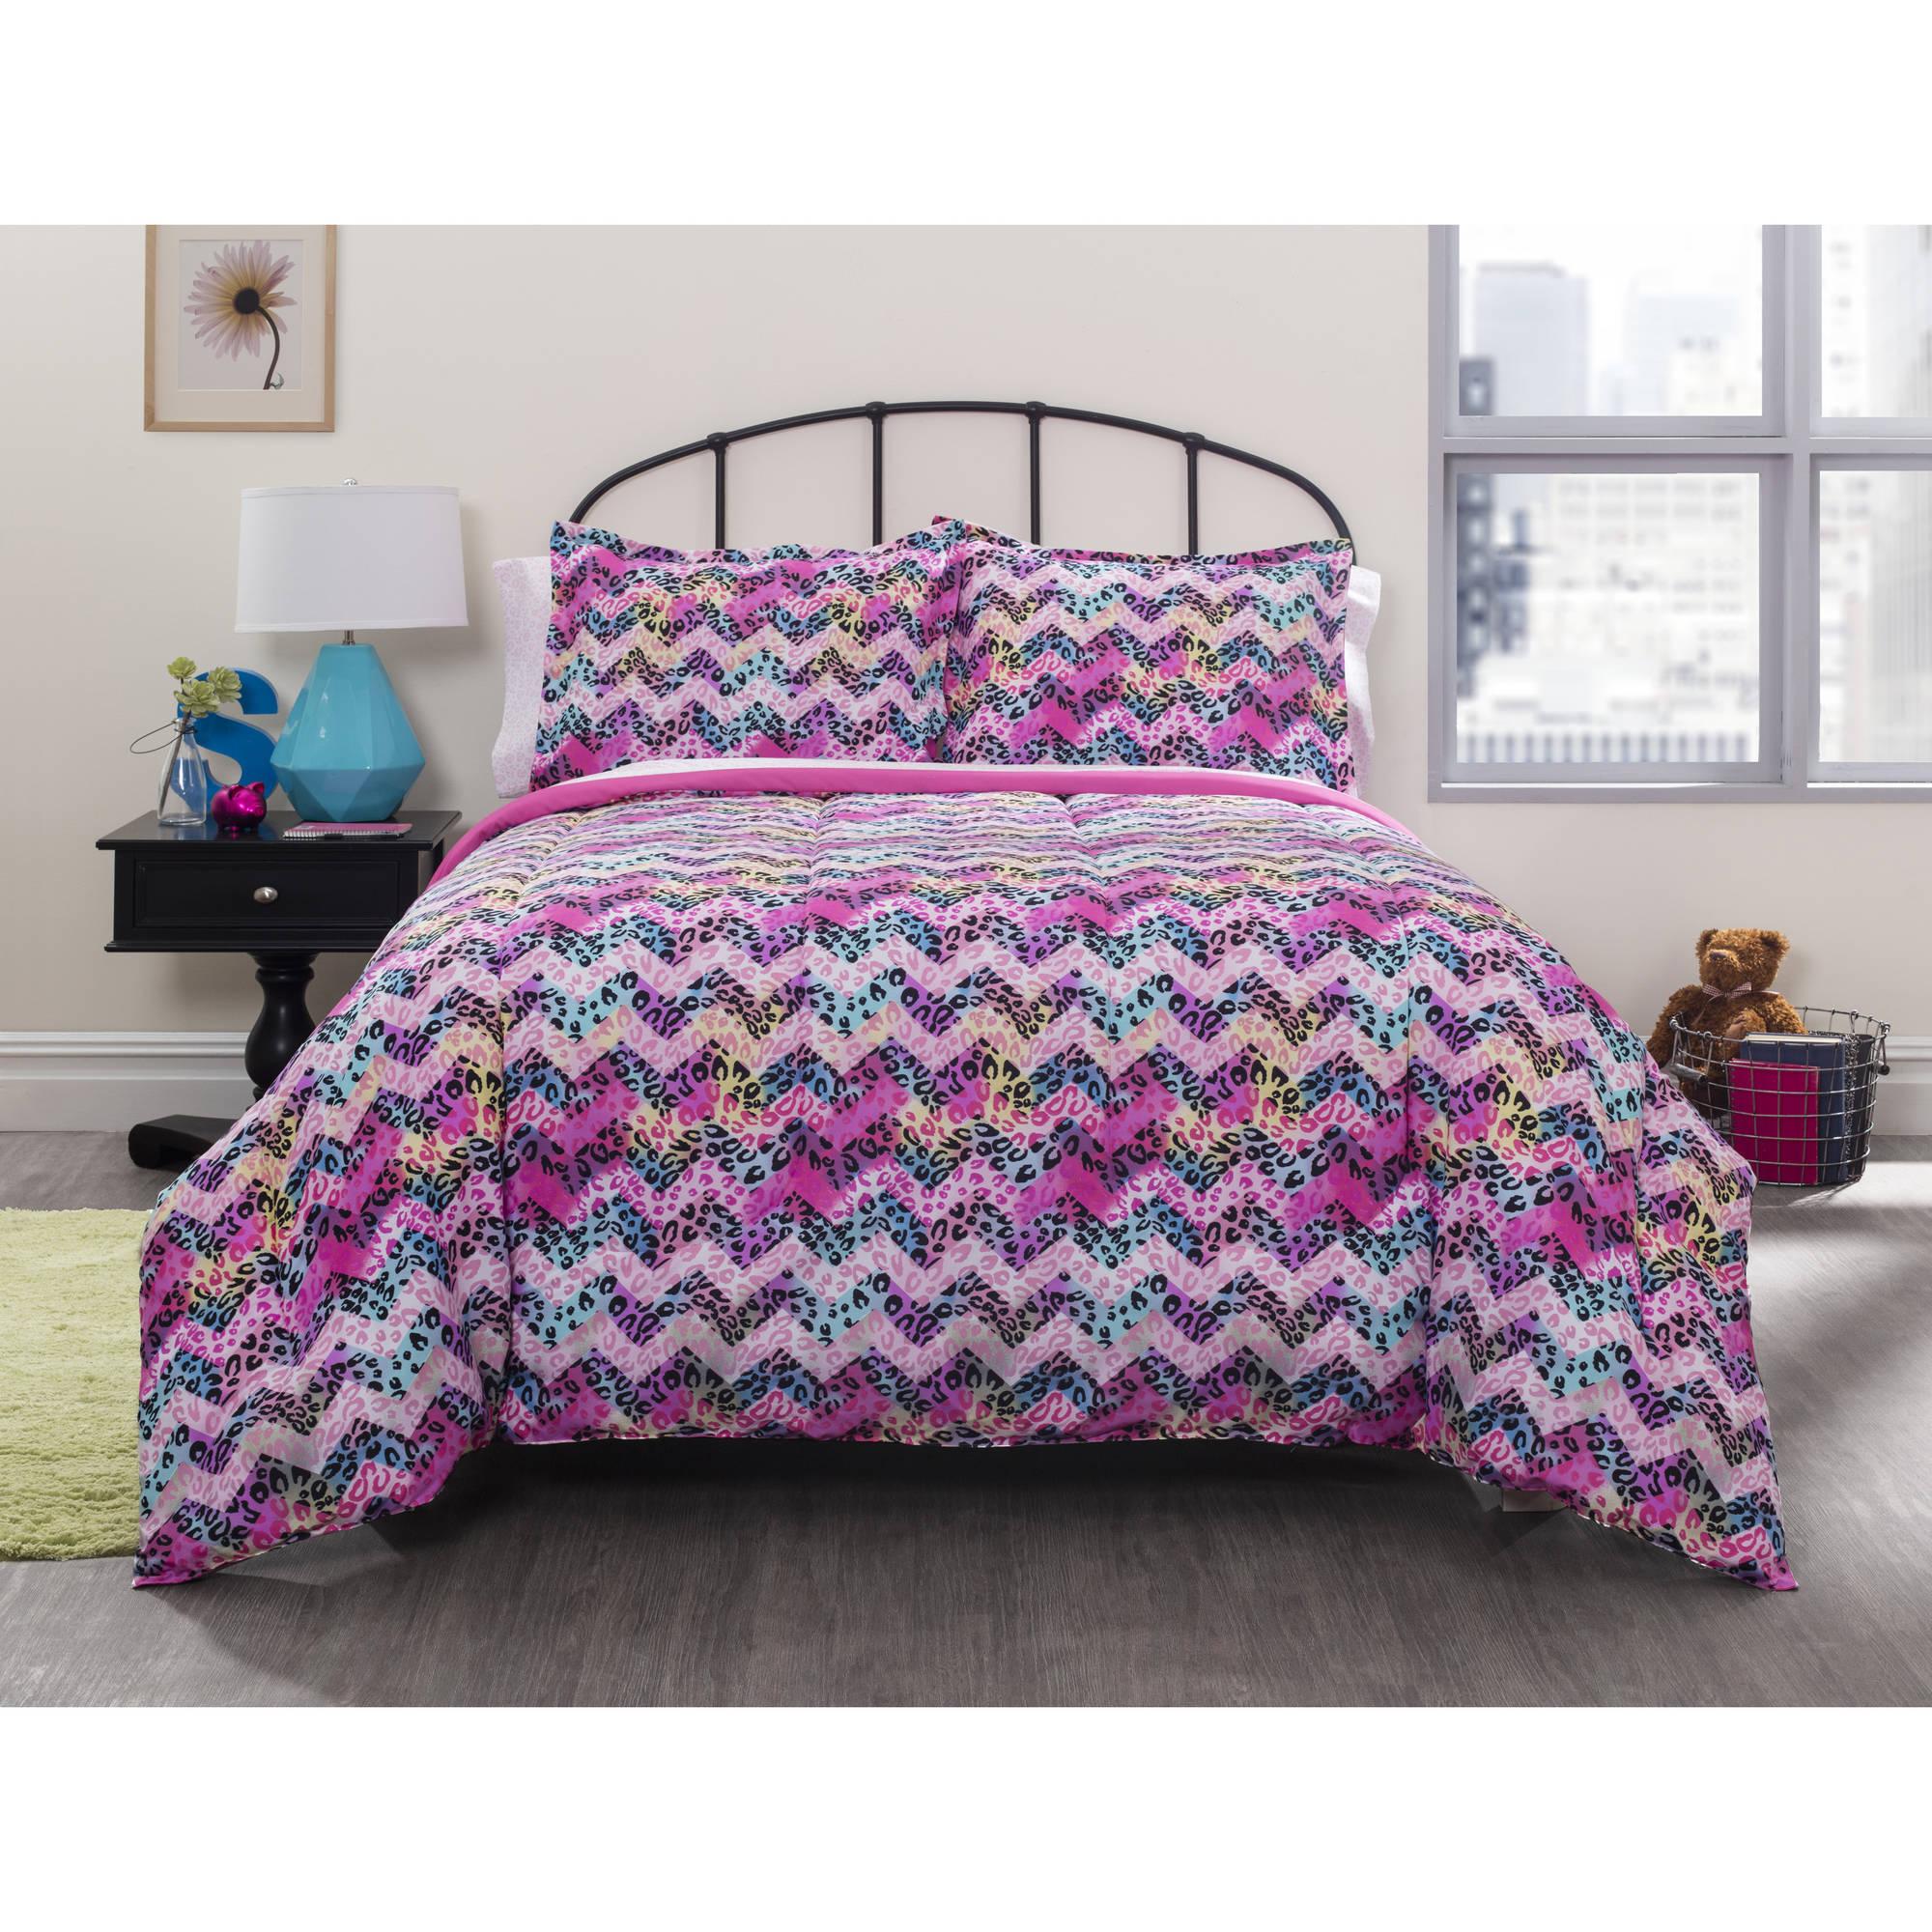 Idea Nuova your zone cheetah chevron bed in a bag bedding set